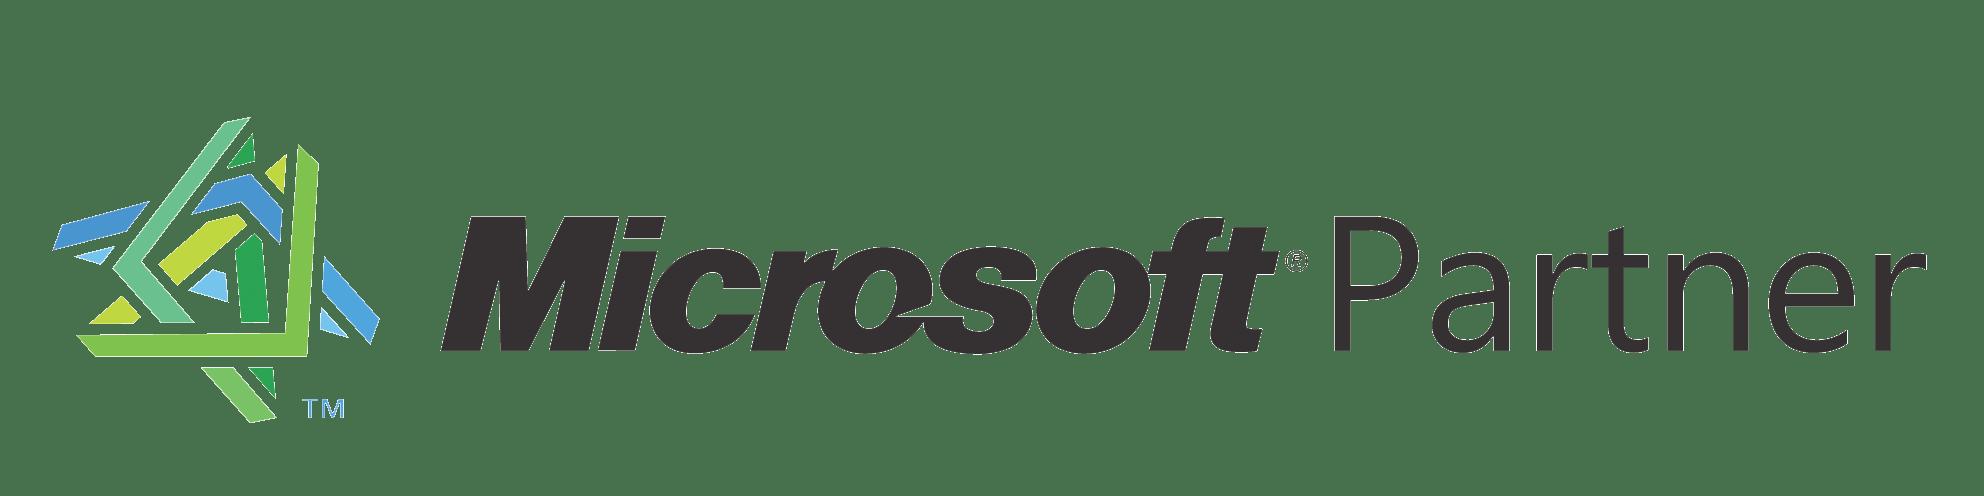 AdInSoft_Microsoft_Partner